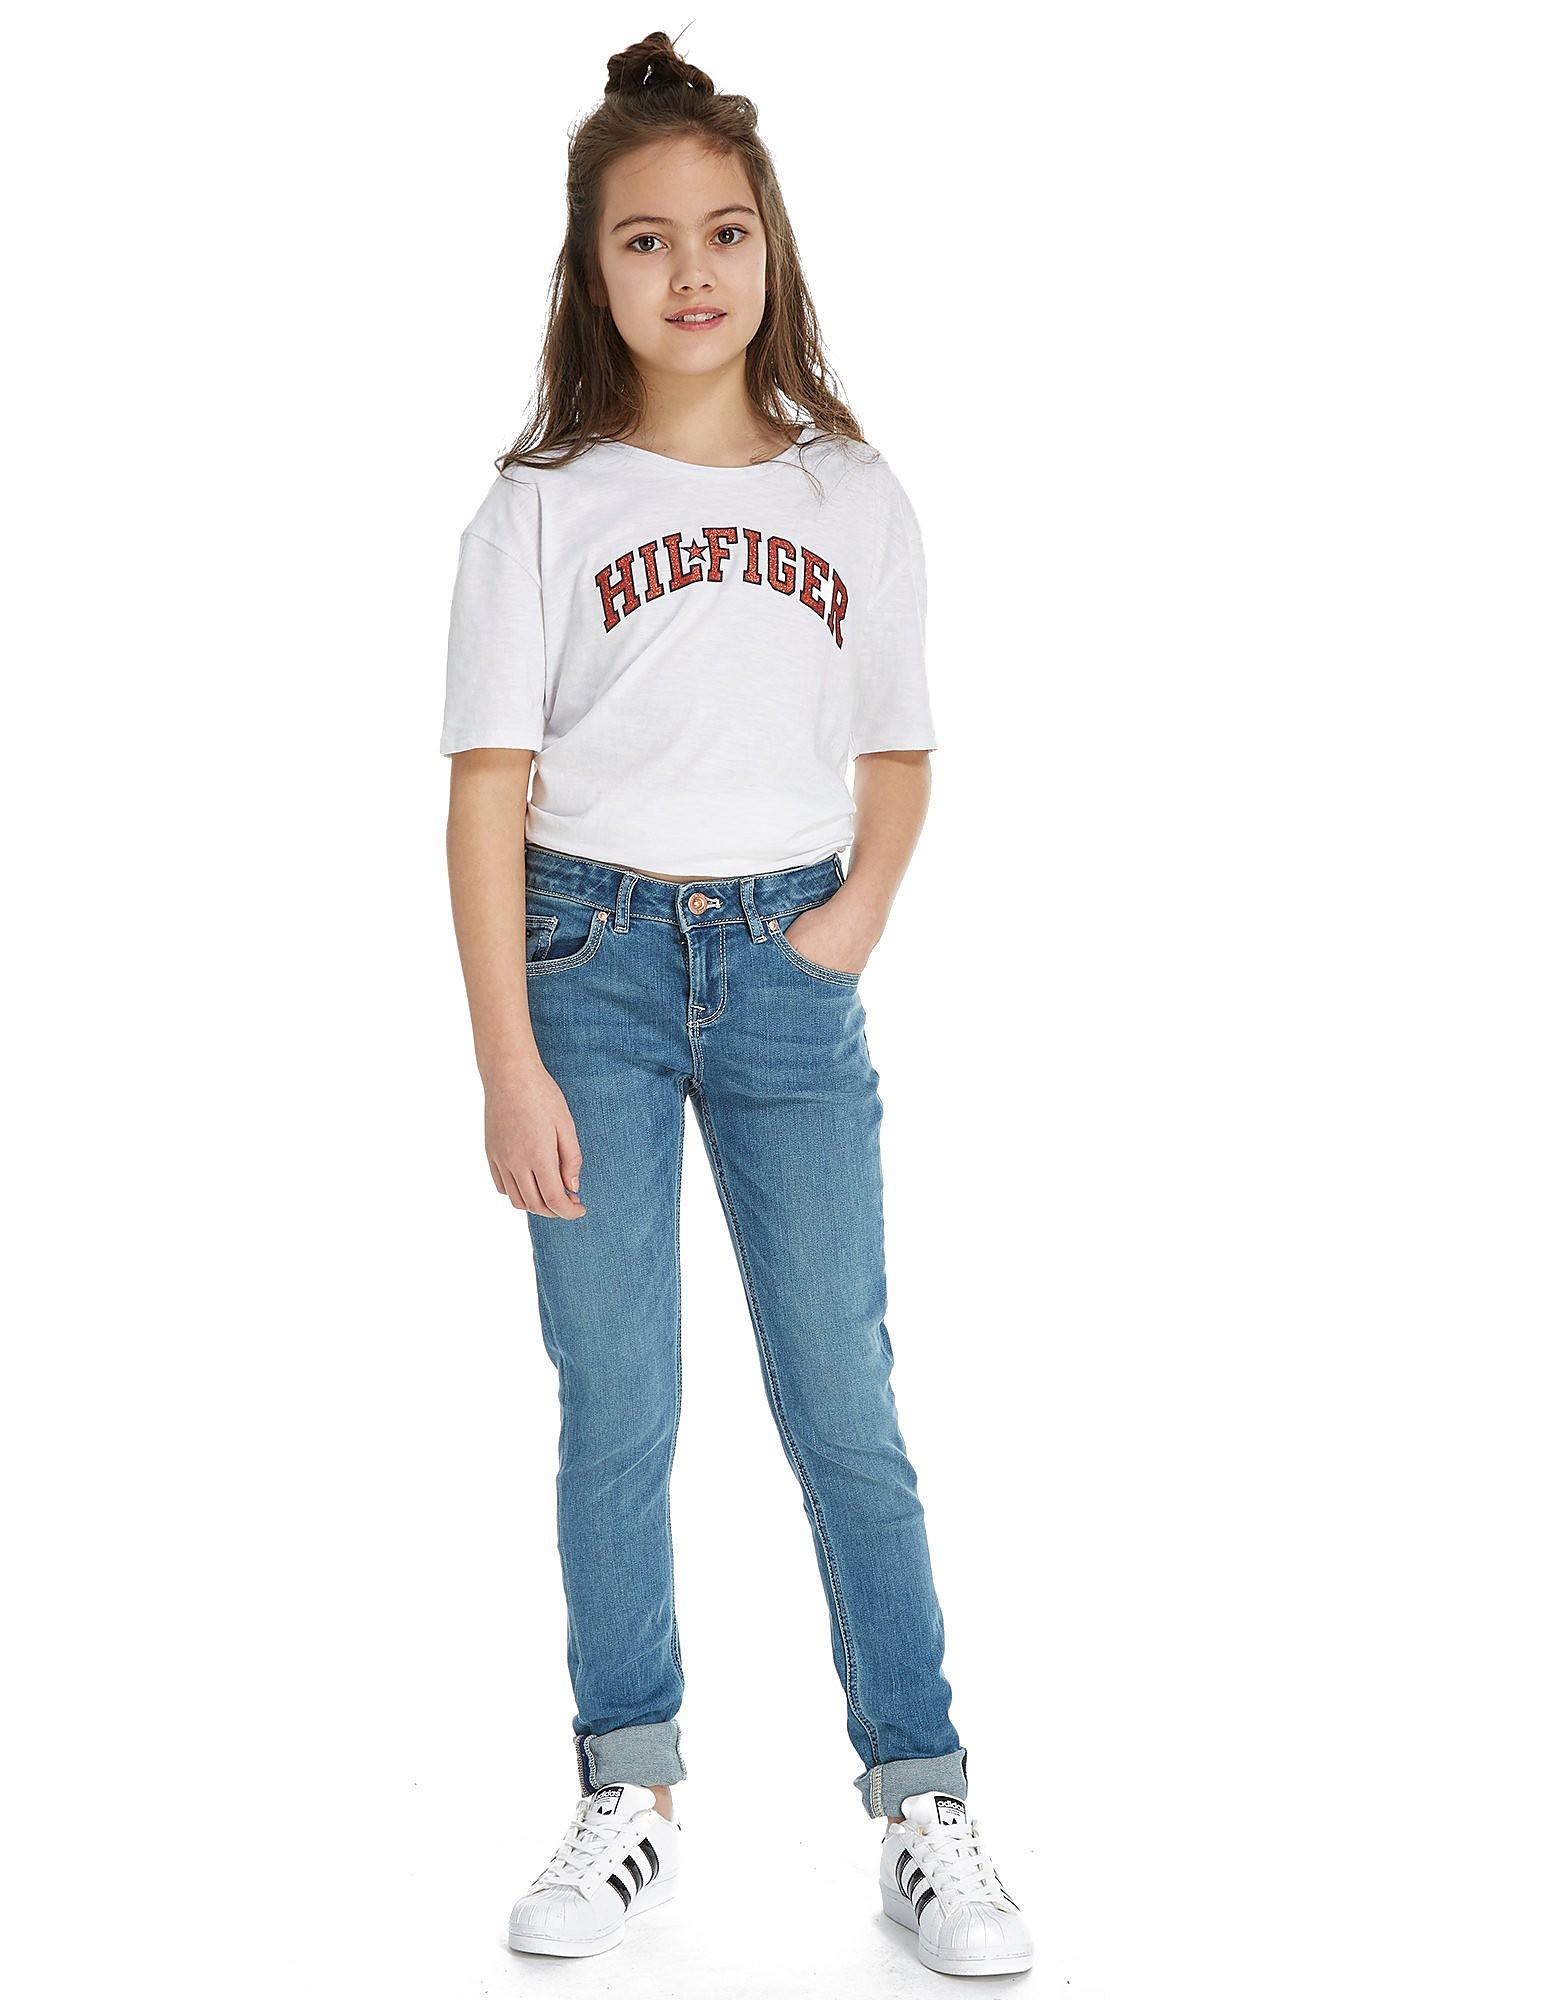 Tommy Hilfiger Girls' Tommy Jeans Junior